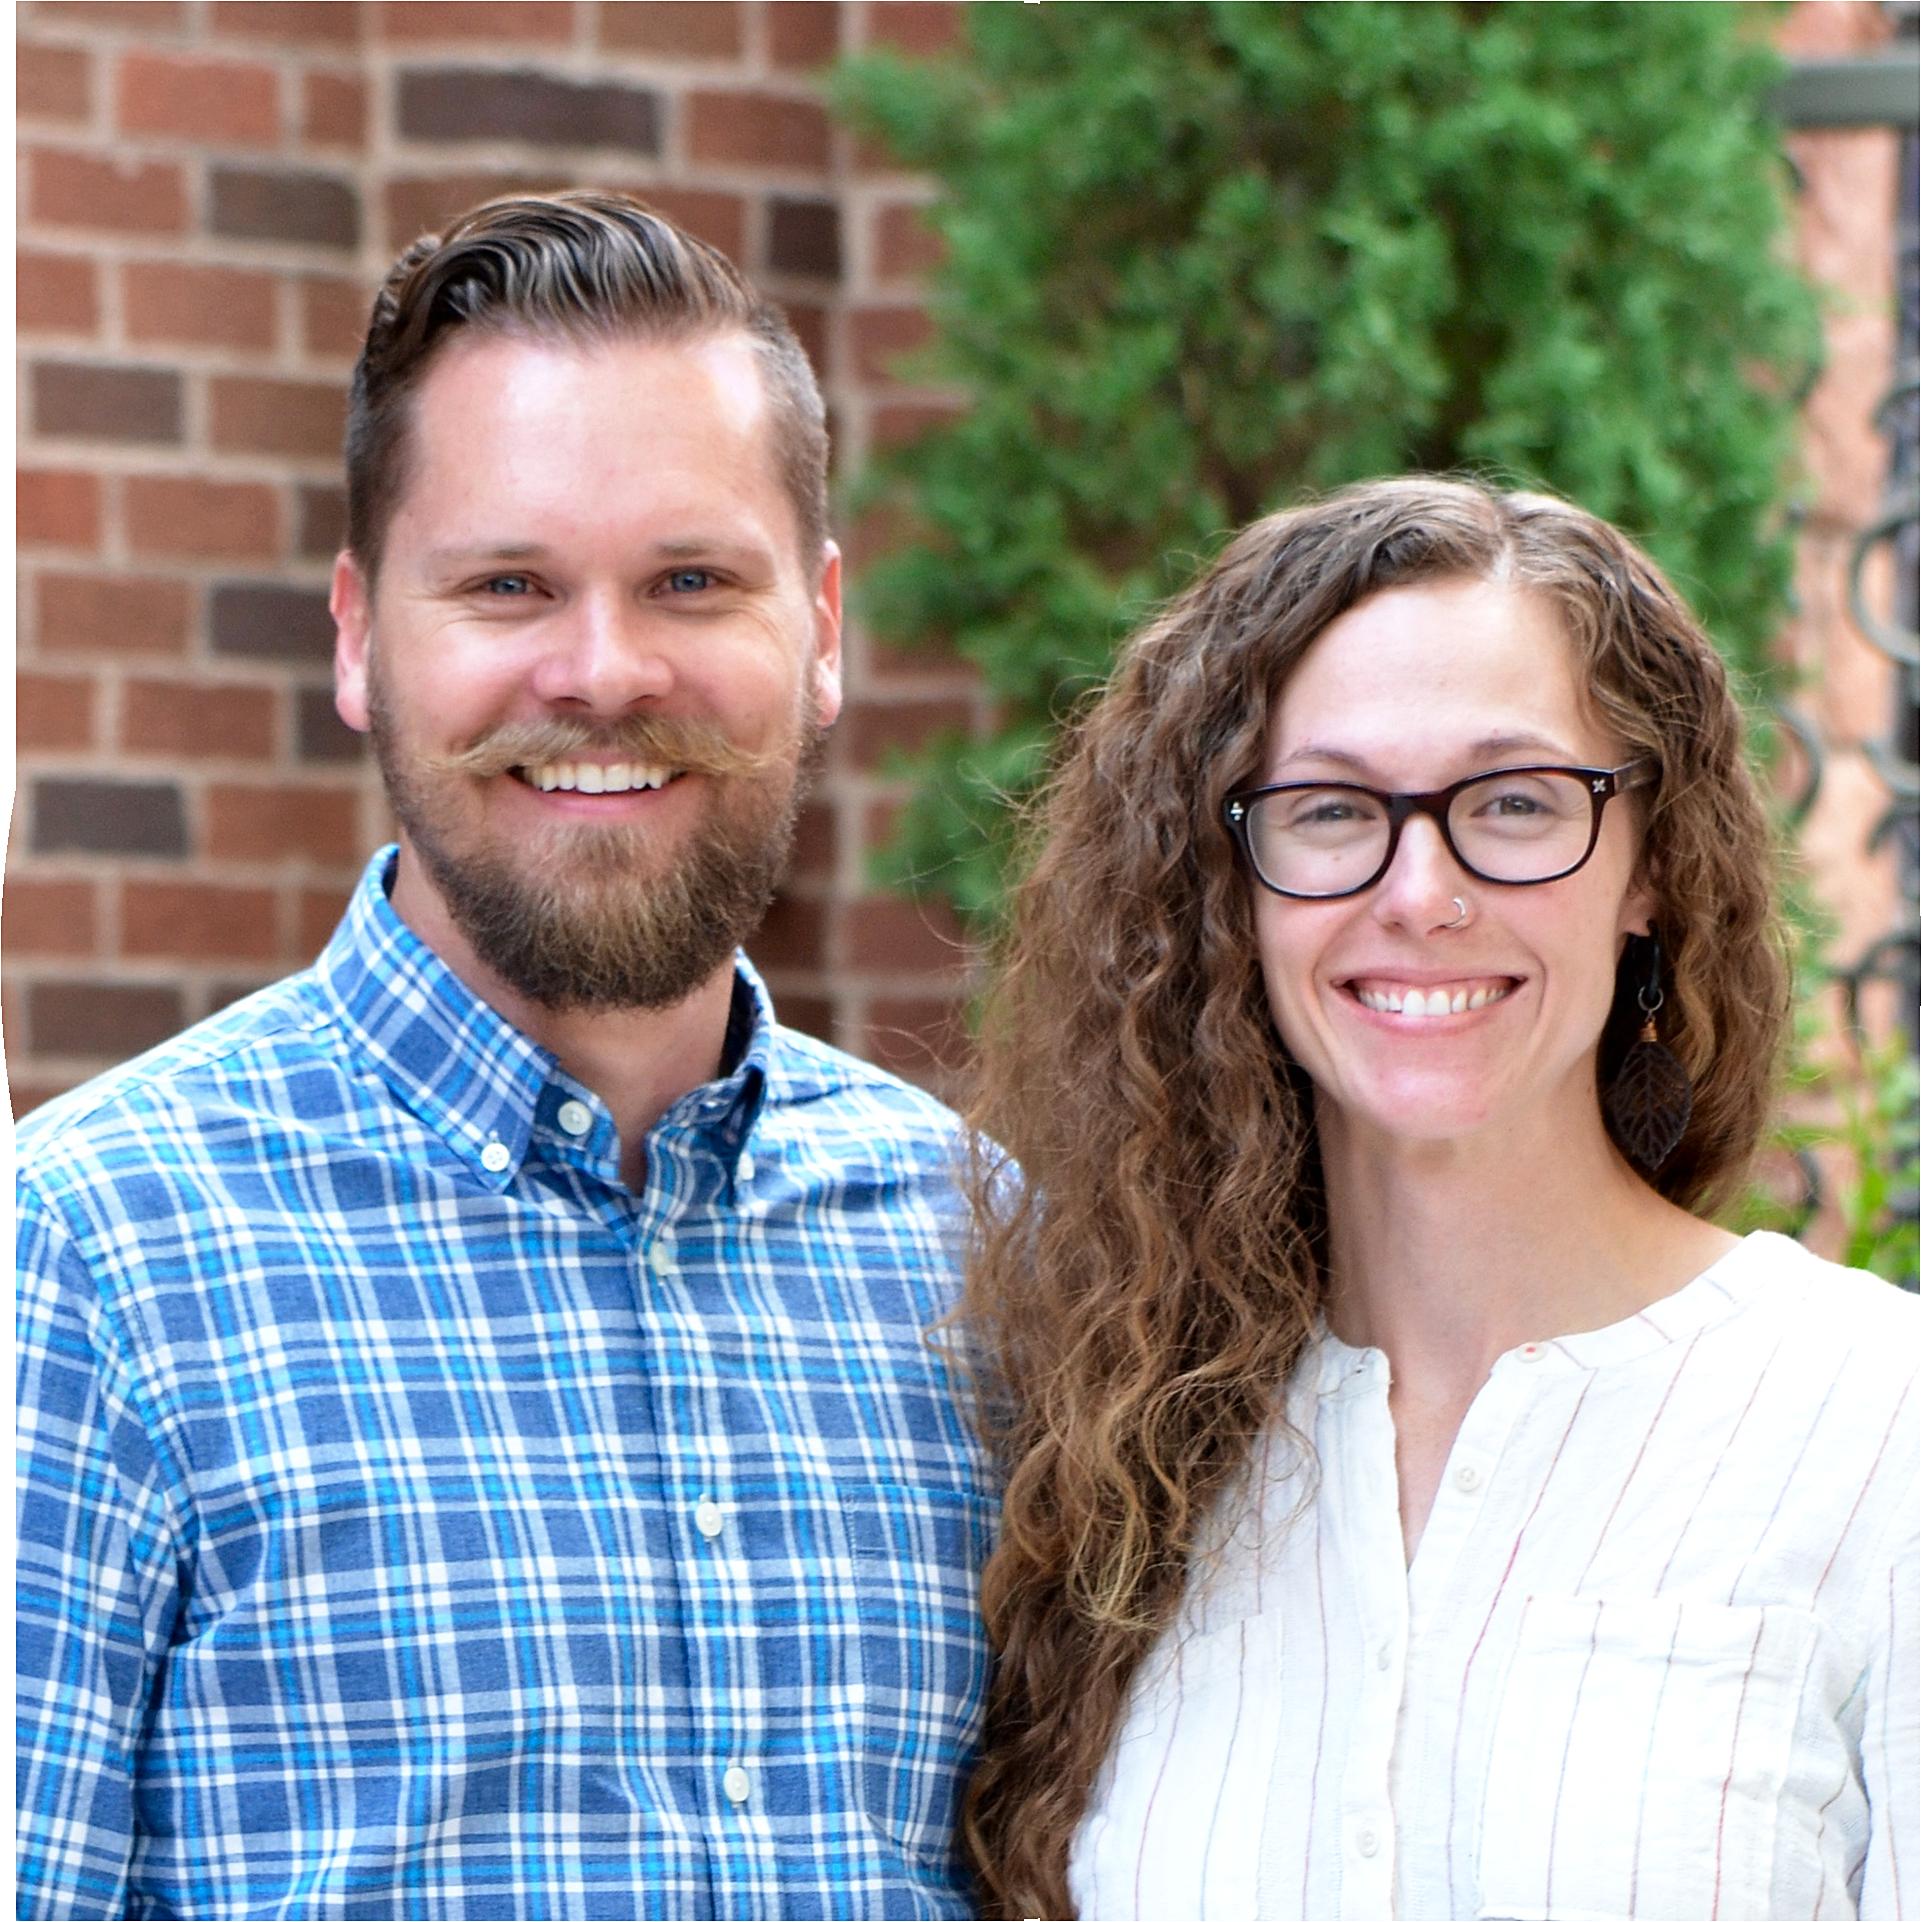 Kyle and Michelle Stevens